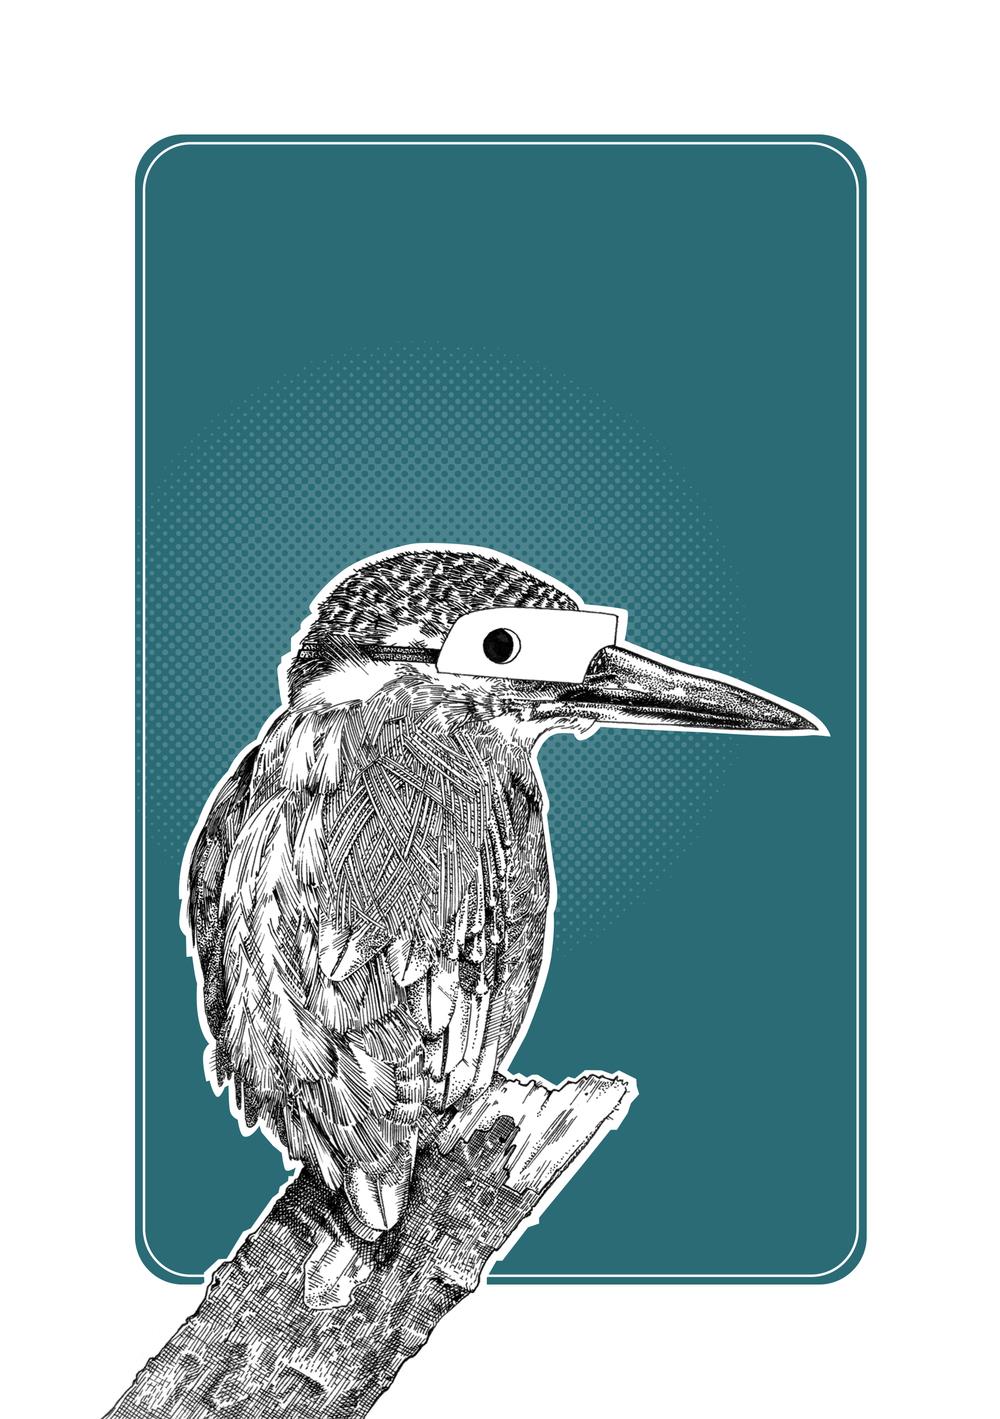 Kingfisher Final XL.jpg